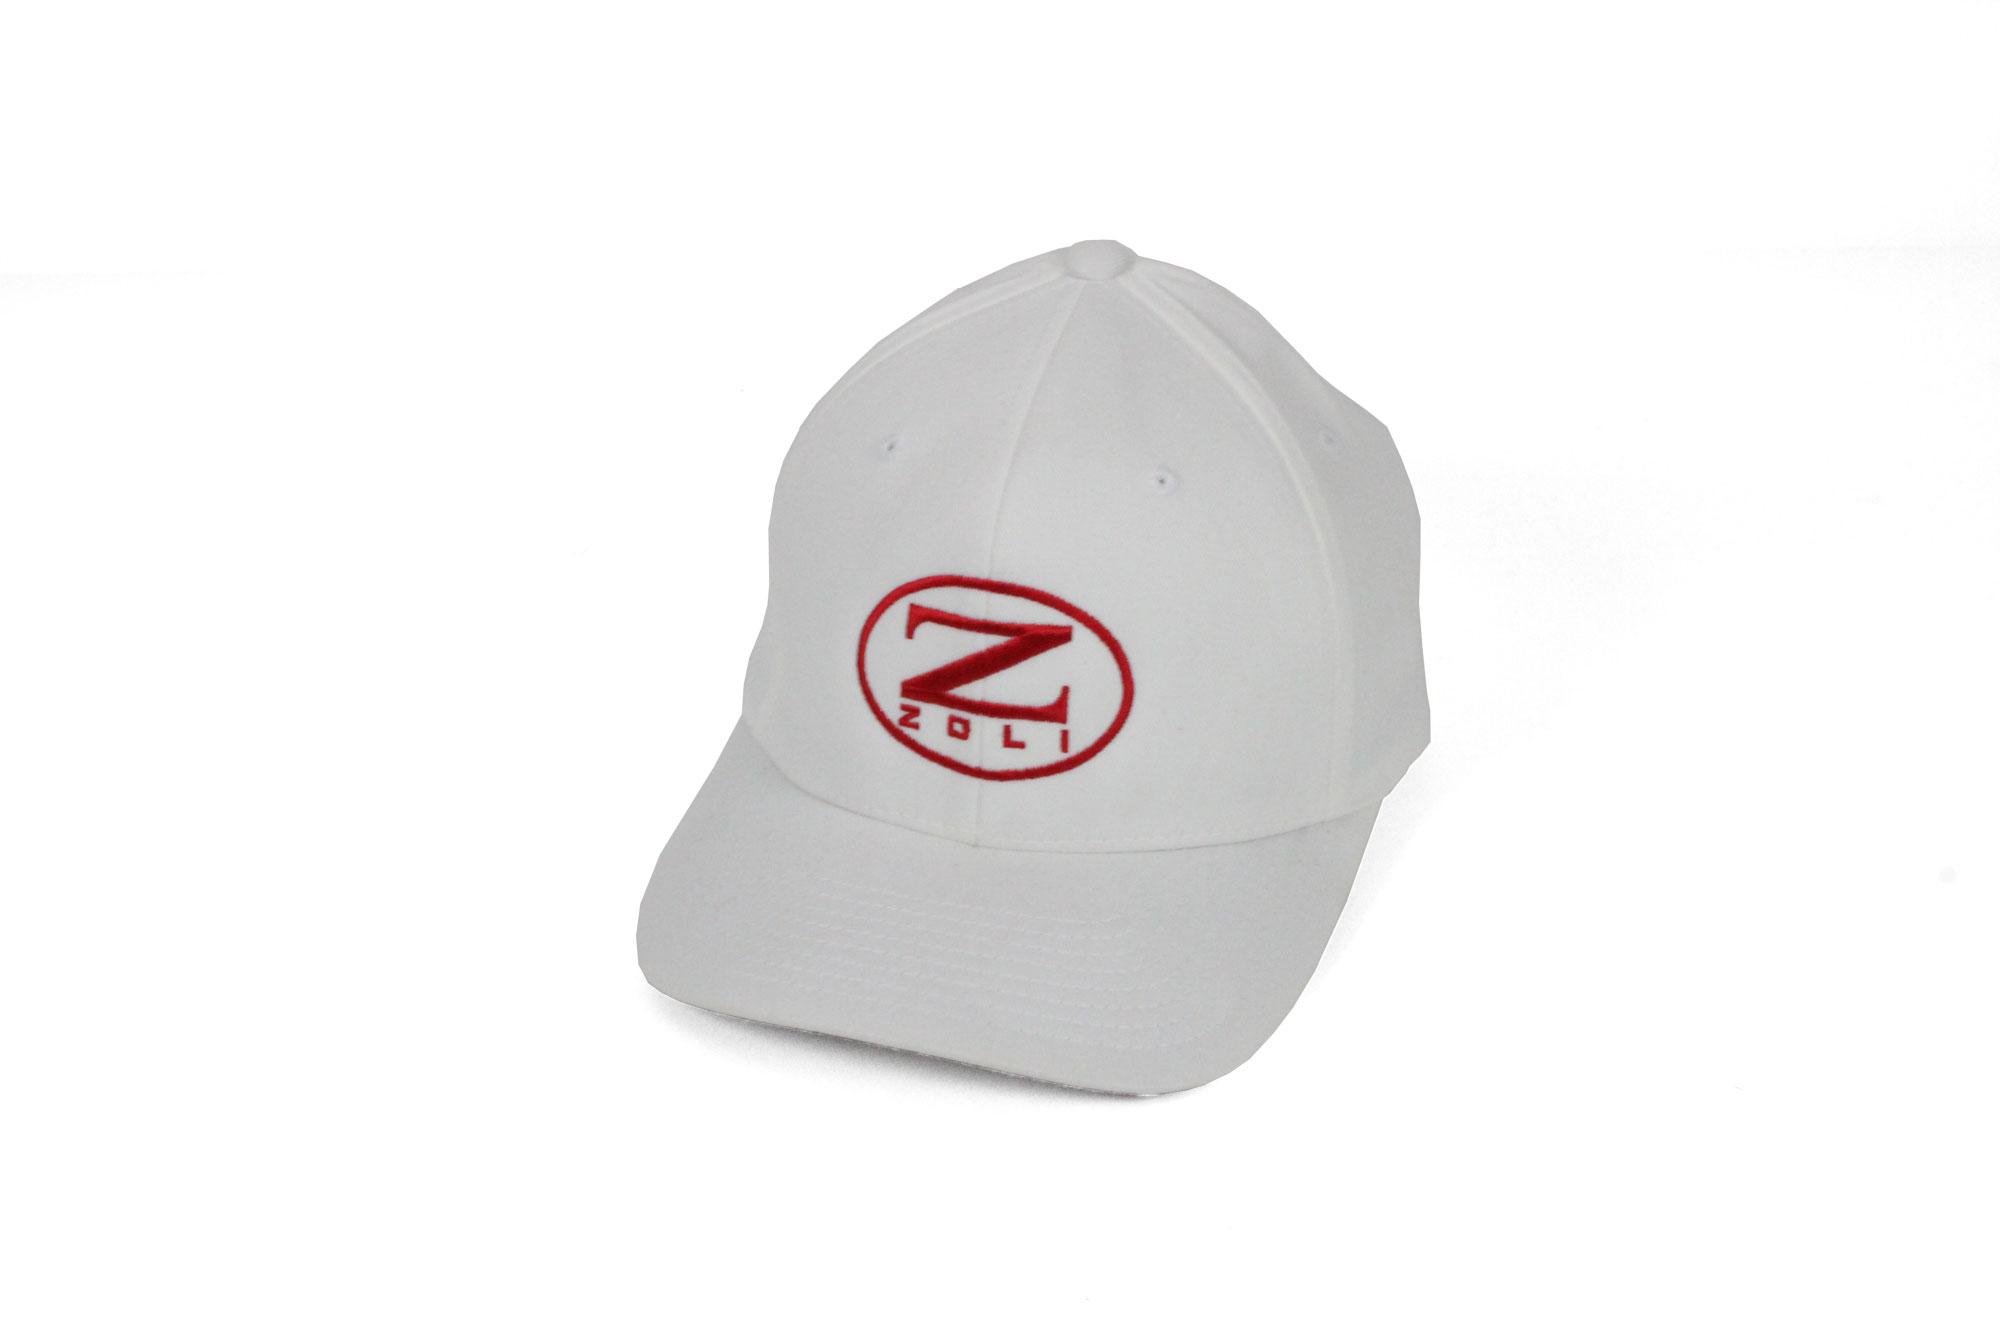 Zoli Embroidered Flexfit® Hat (White)